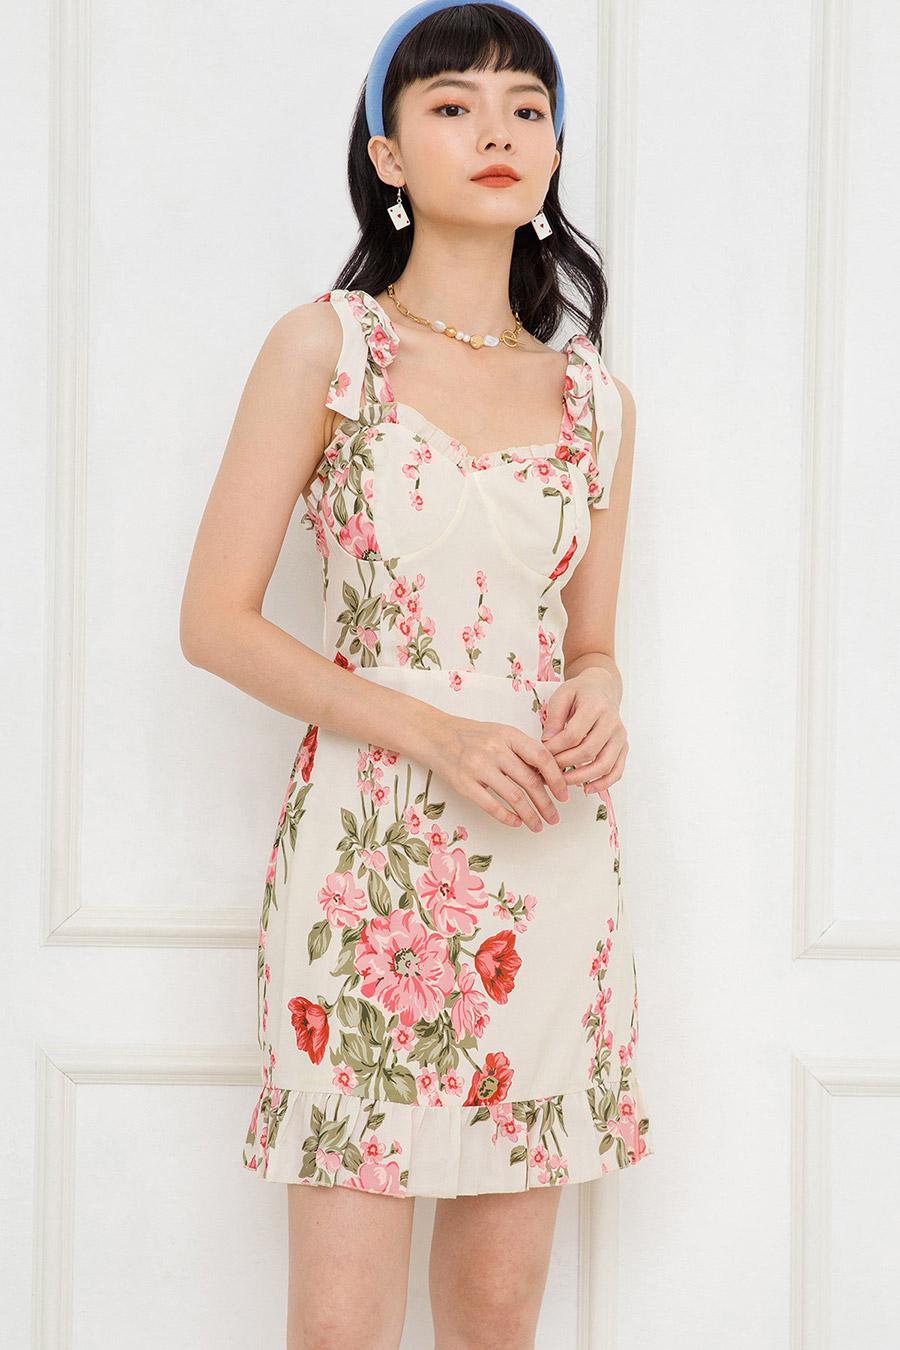 ELOI DRESS - IVORY FLEUR